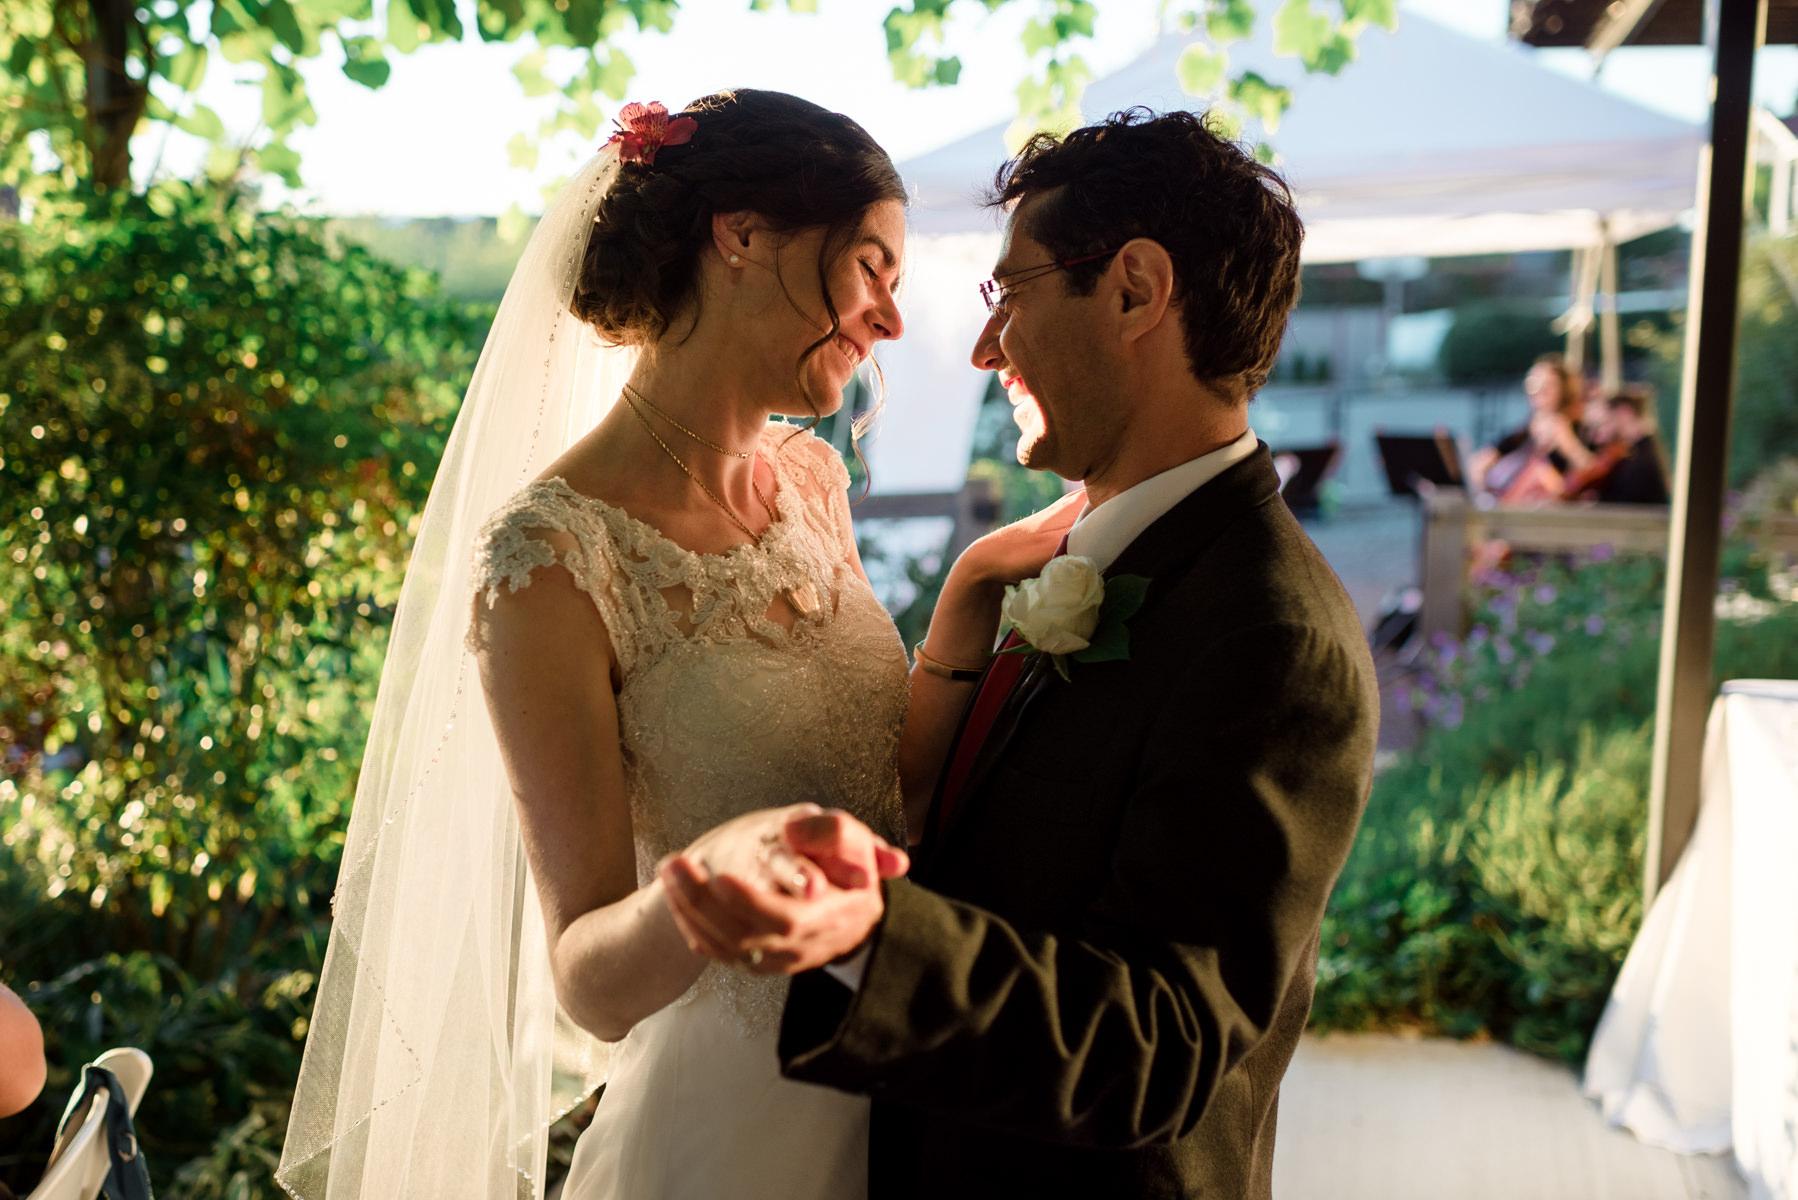 Andrew Tat - Documentary Wedding Photography - Kirkland, Washington - Emily & Cuauh - 46.JPG